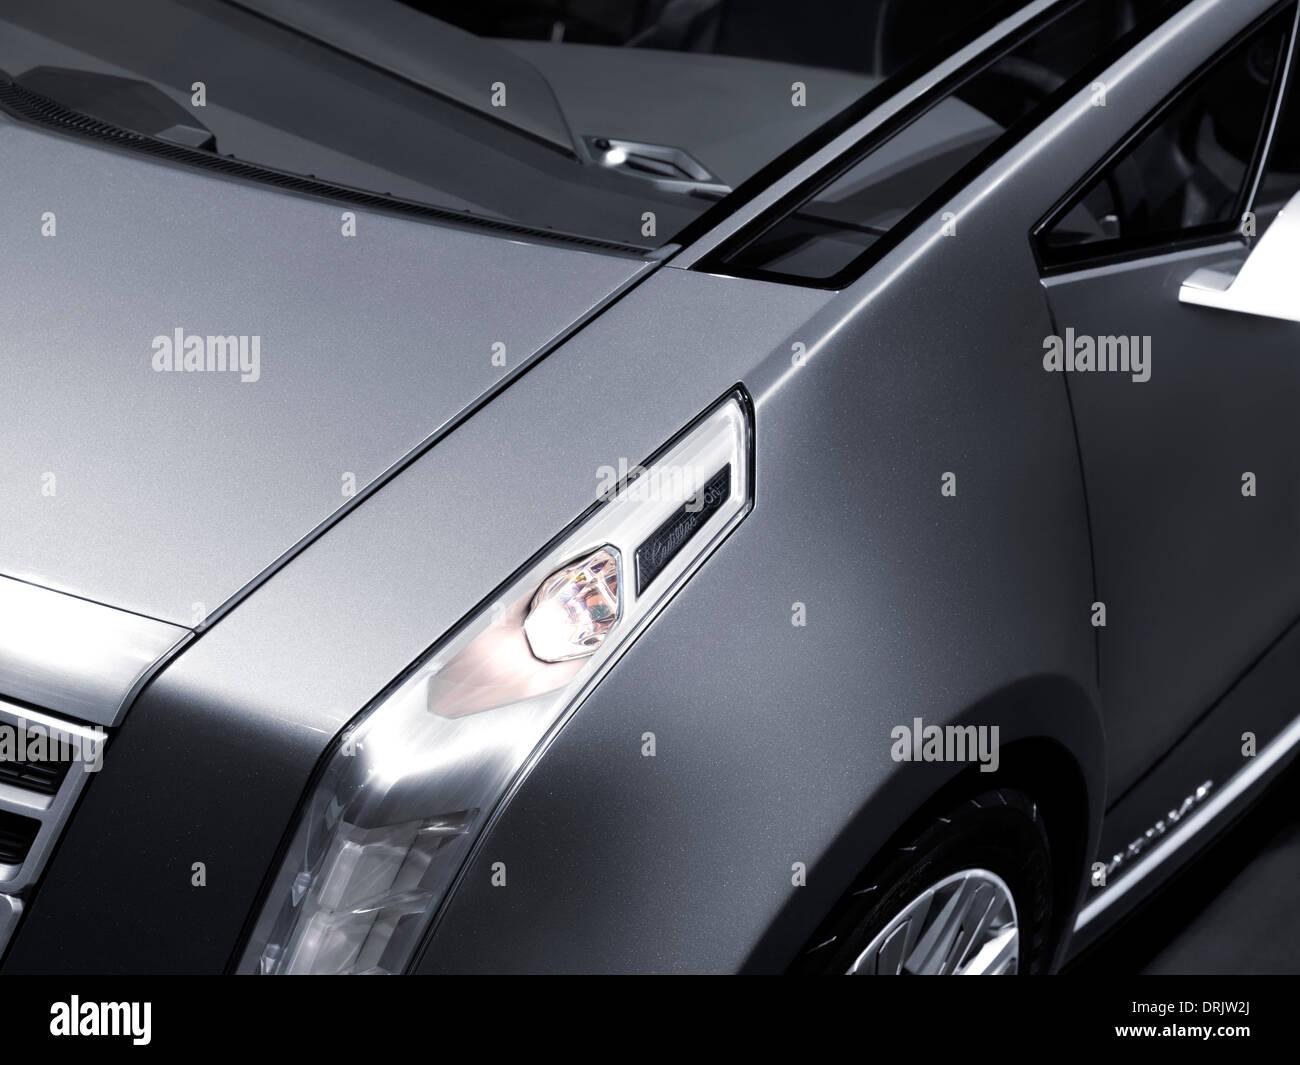 Closeup detail of 2011 Cadillac ULC Urban Luxury Concept car - Stock Image